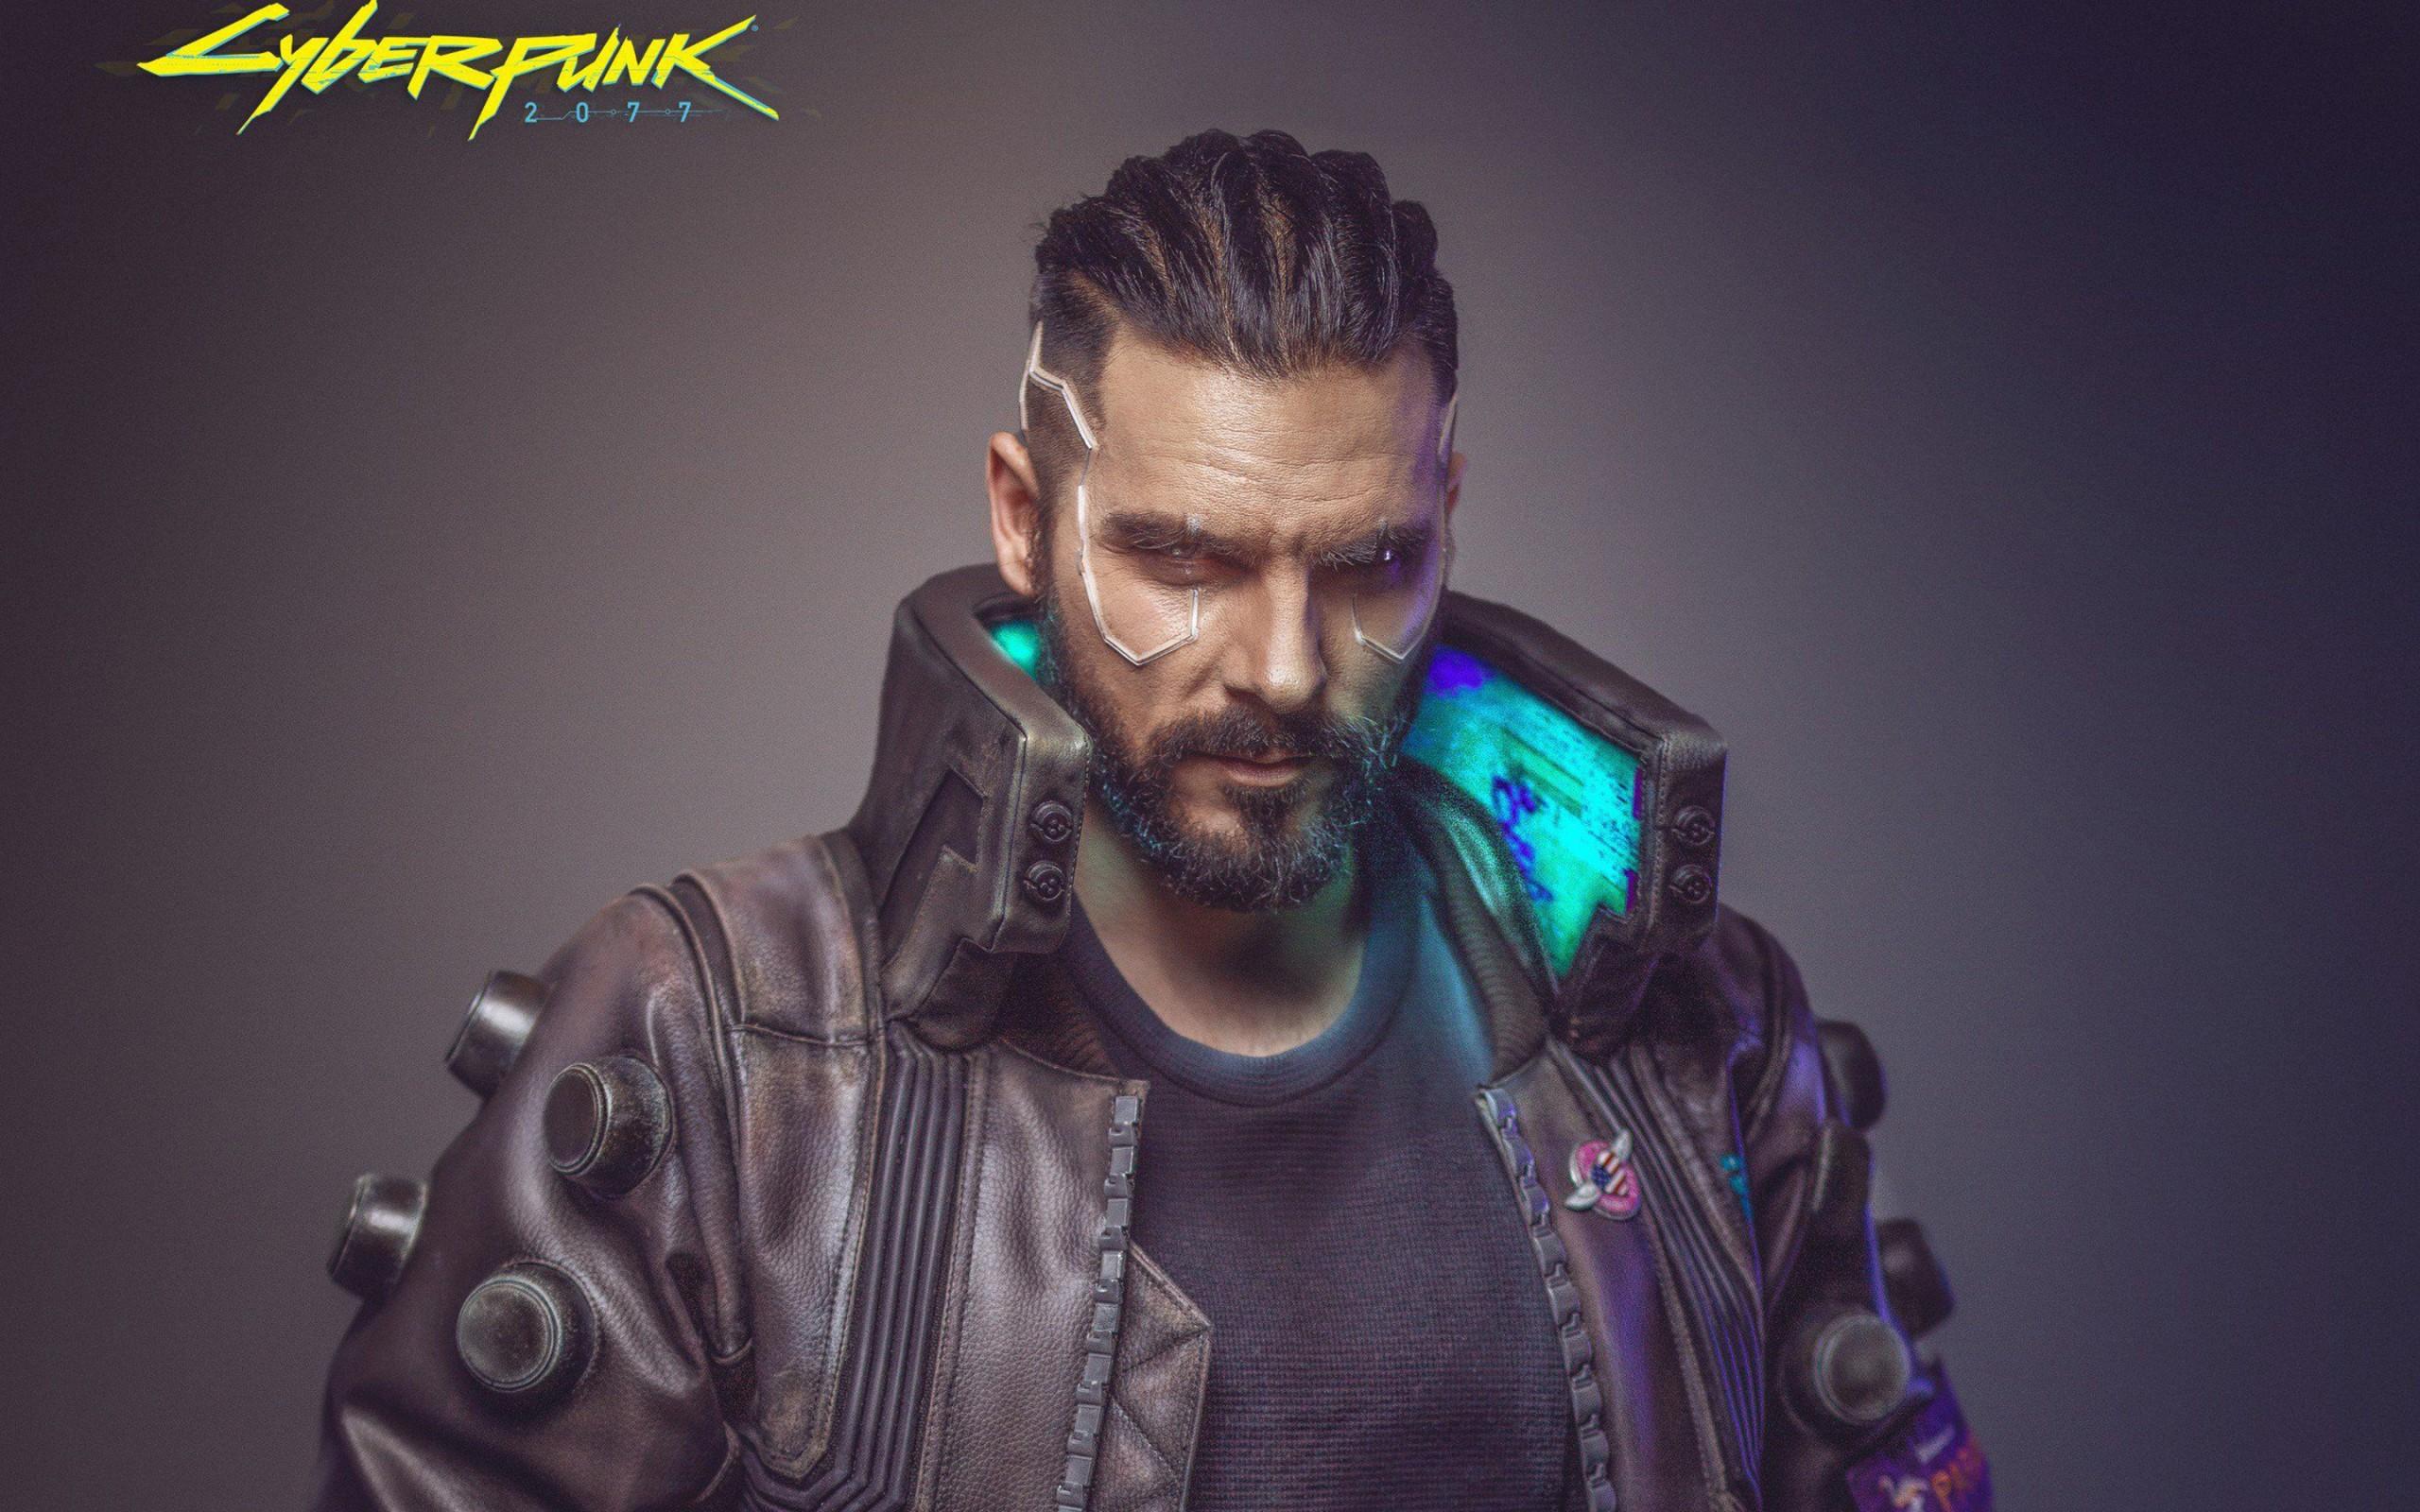 X Men Iphone Wallpaper Hd Cyberpunk 2077 Male Cosplay Wallpapers Hd Wallpapers